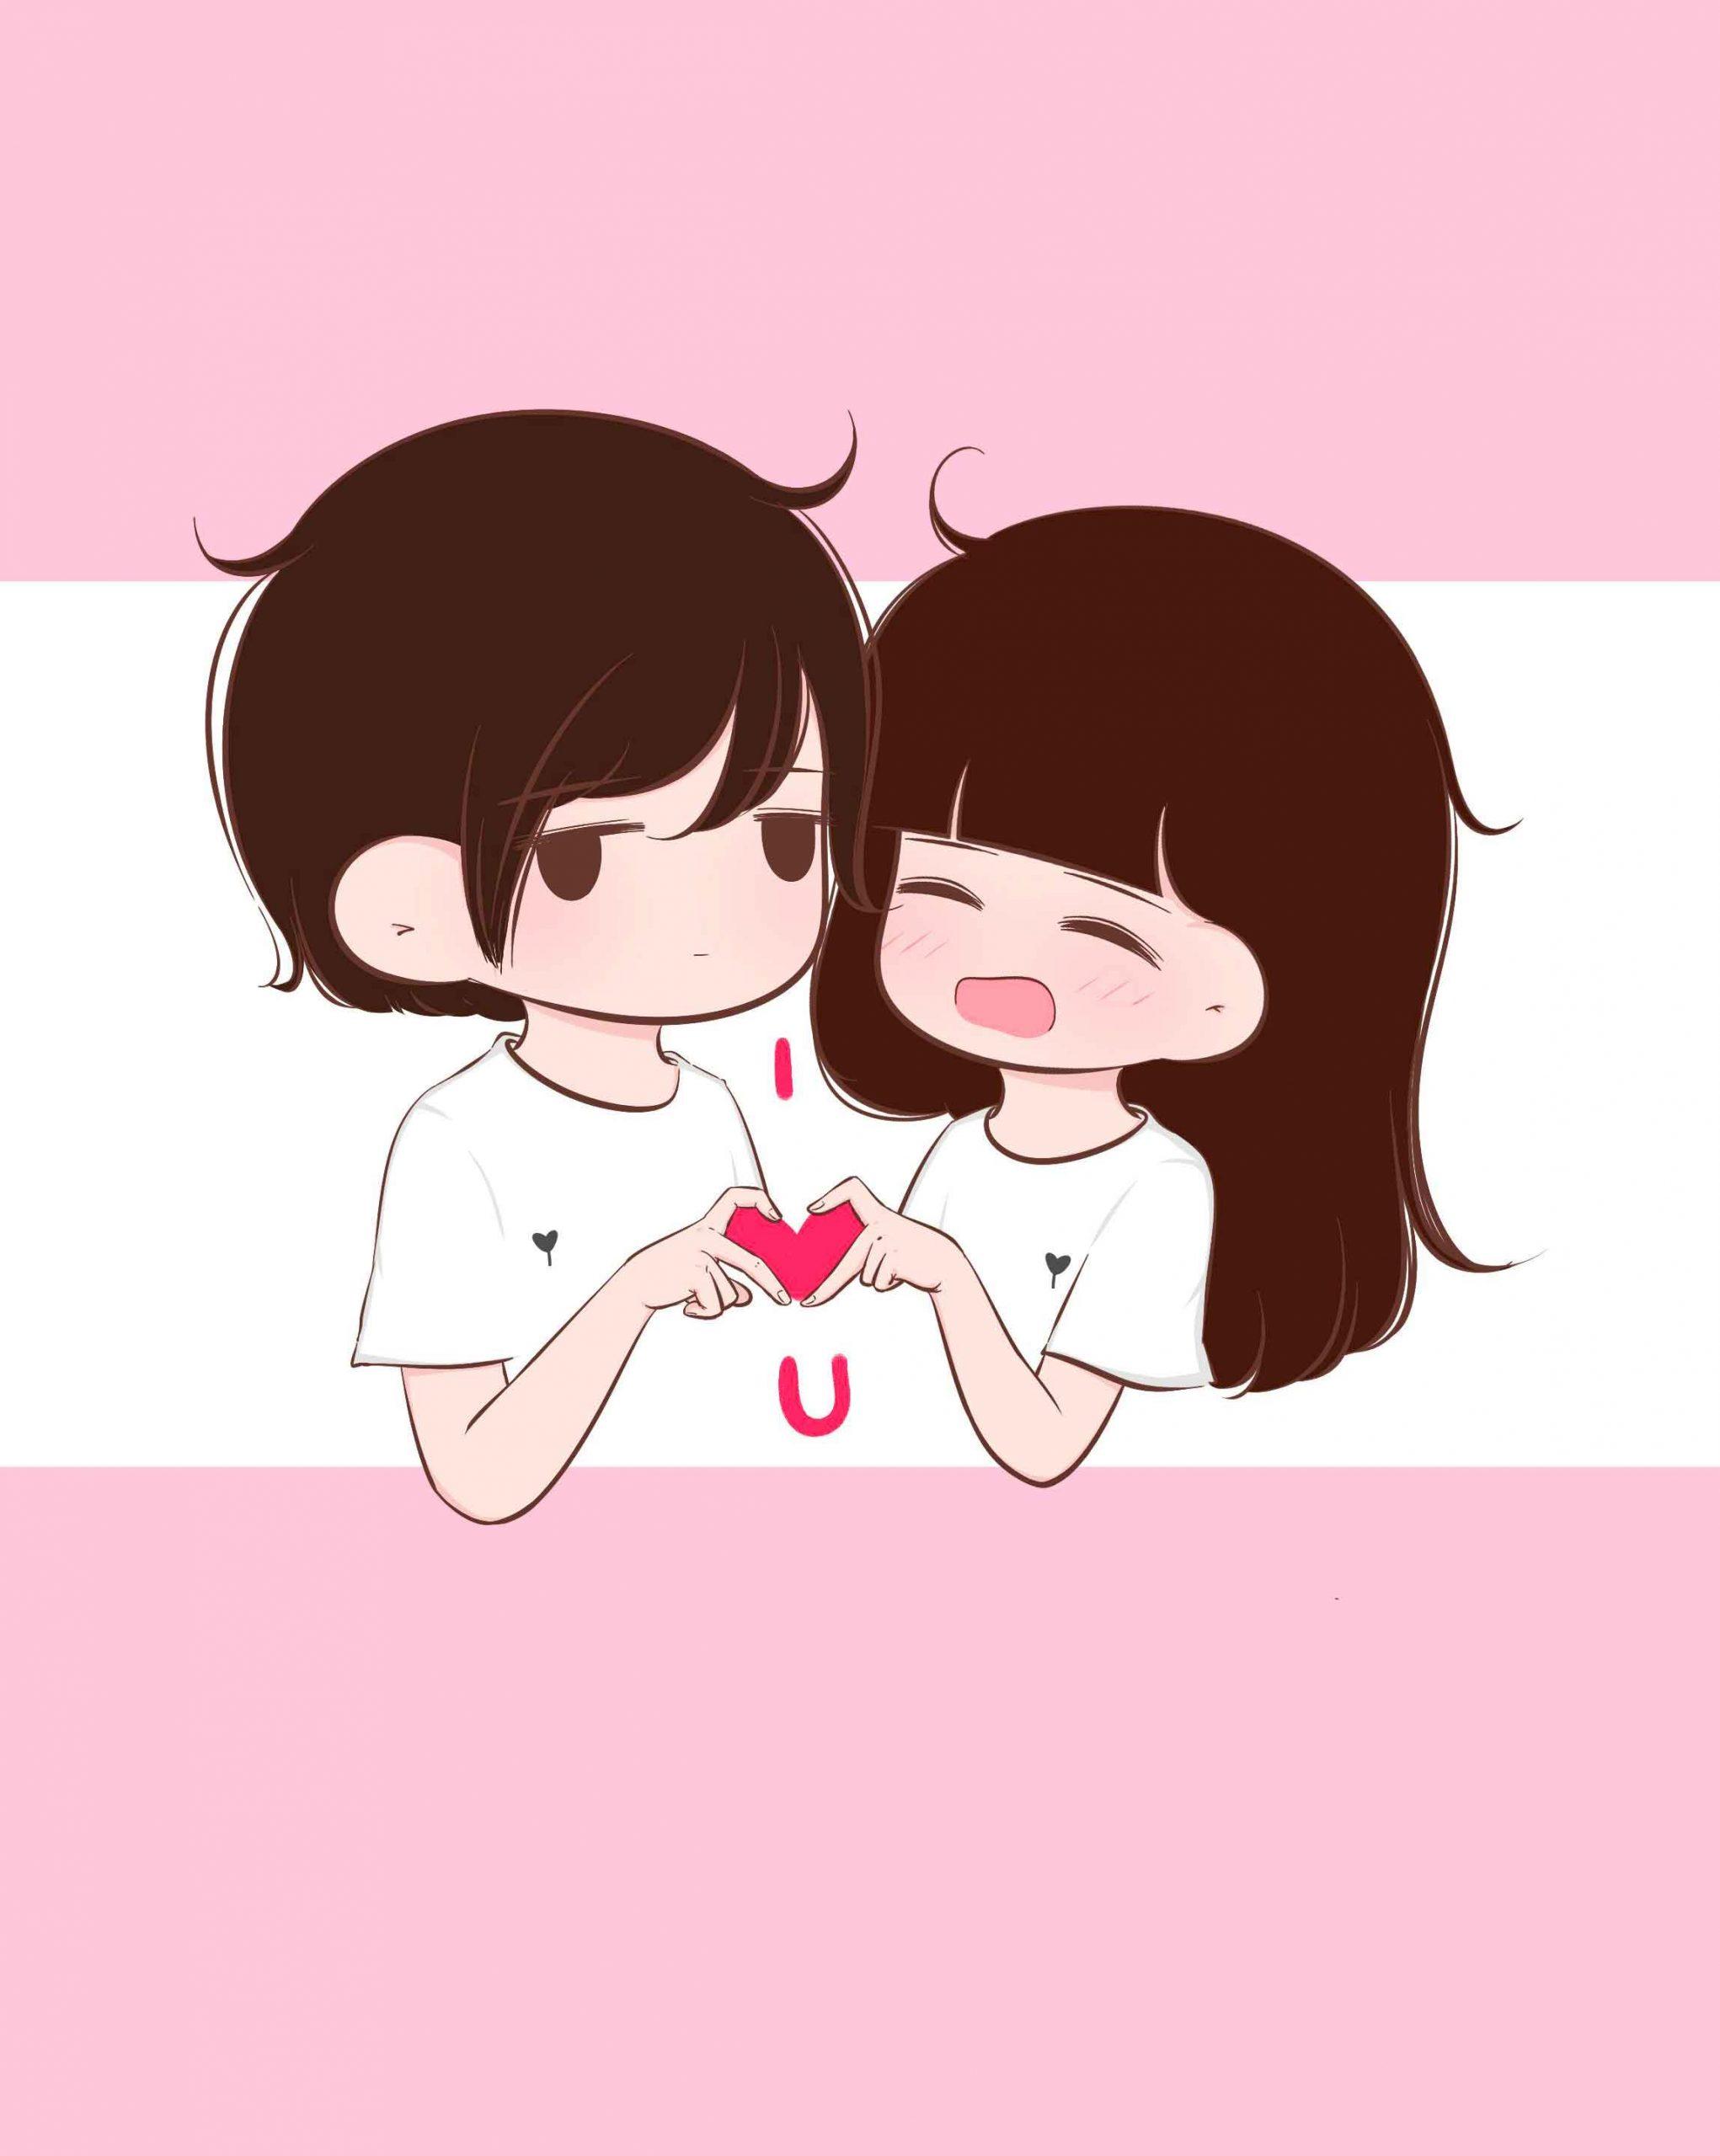 beautiful cute love 1080p Whatsapp dp pics hd